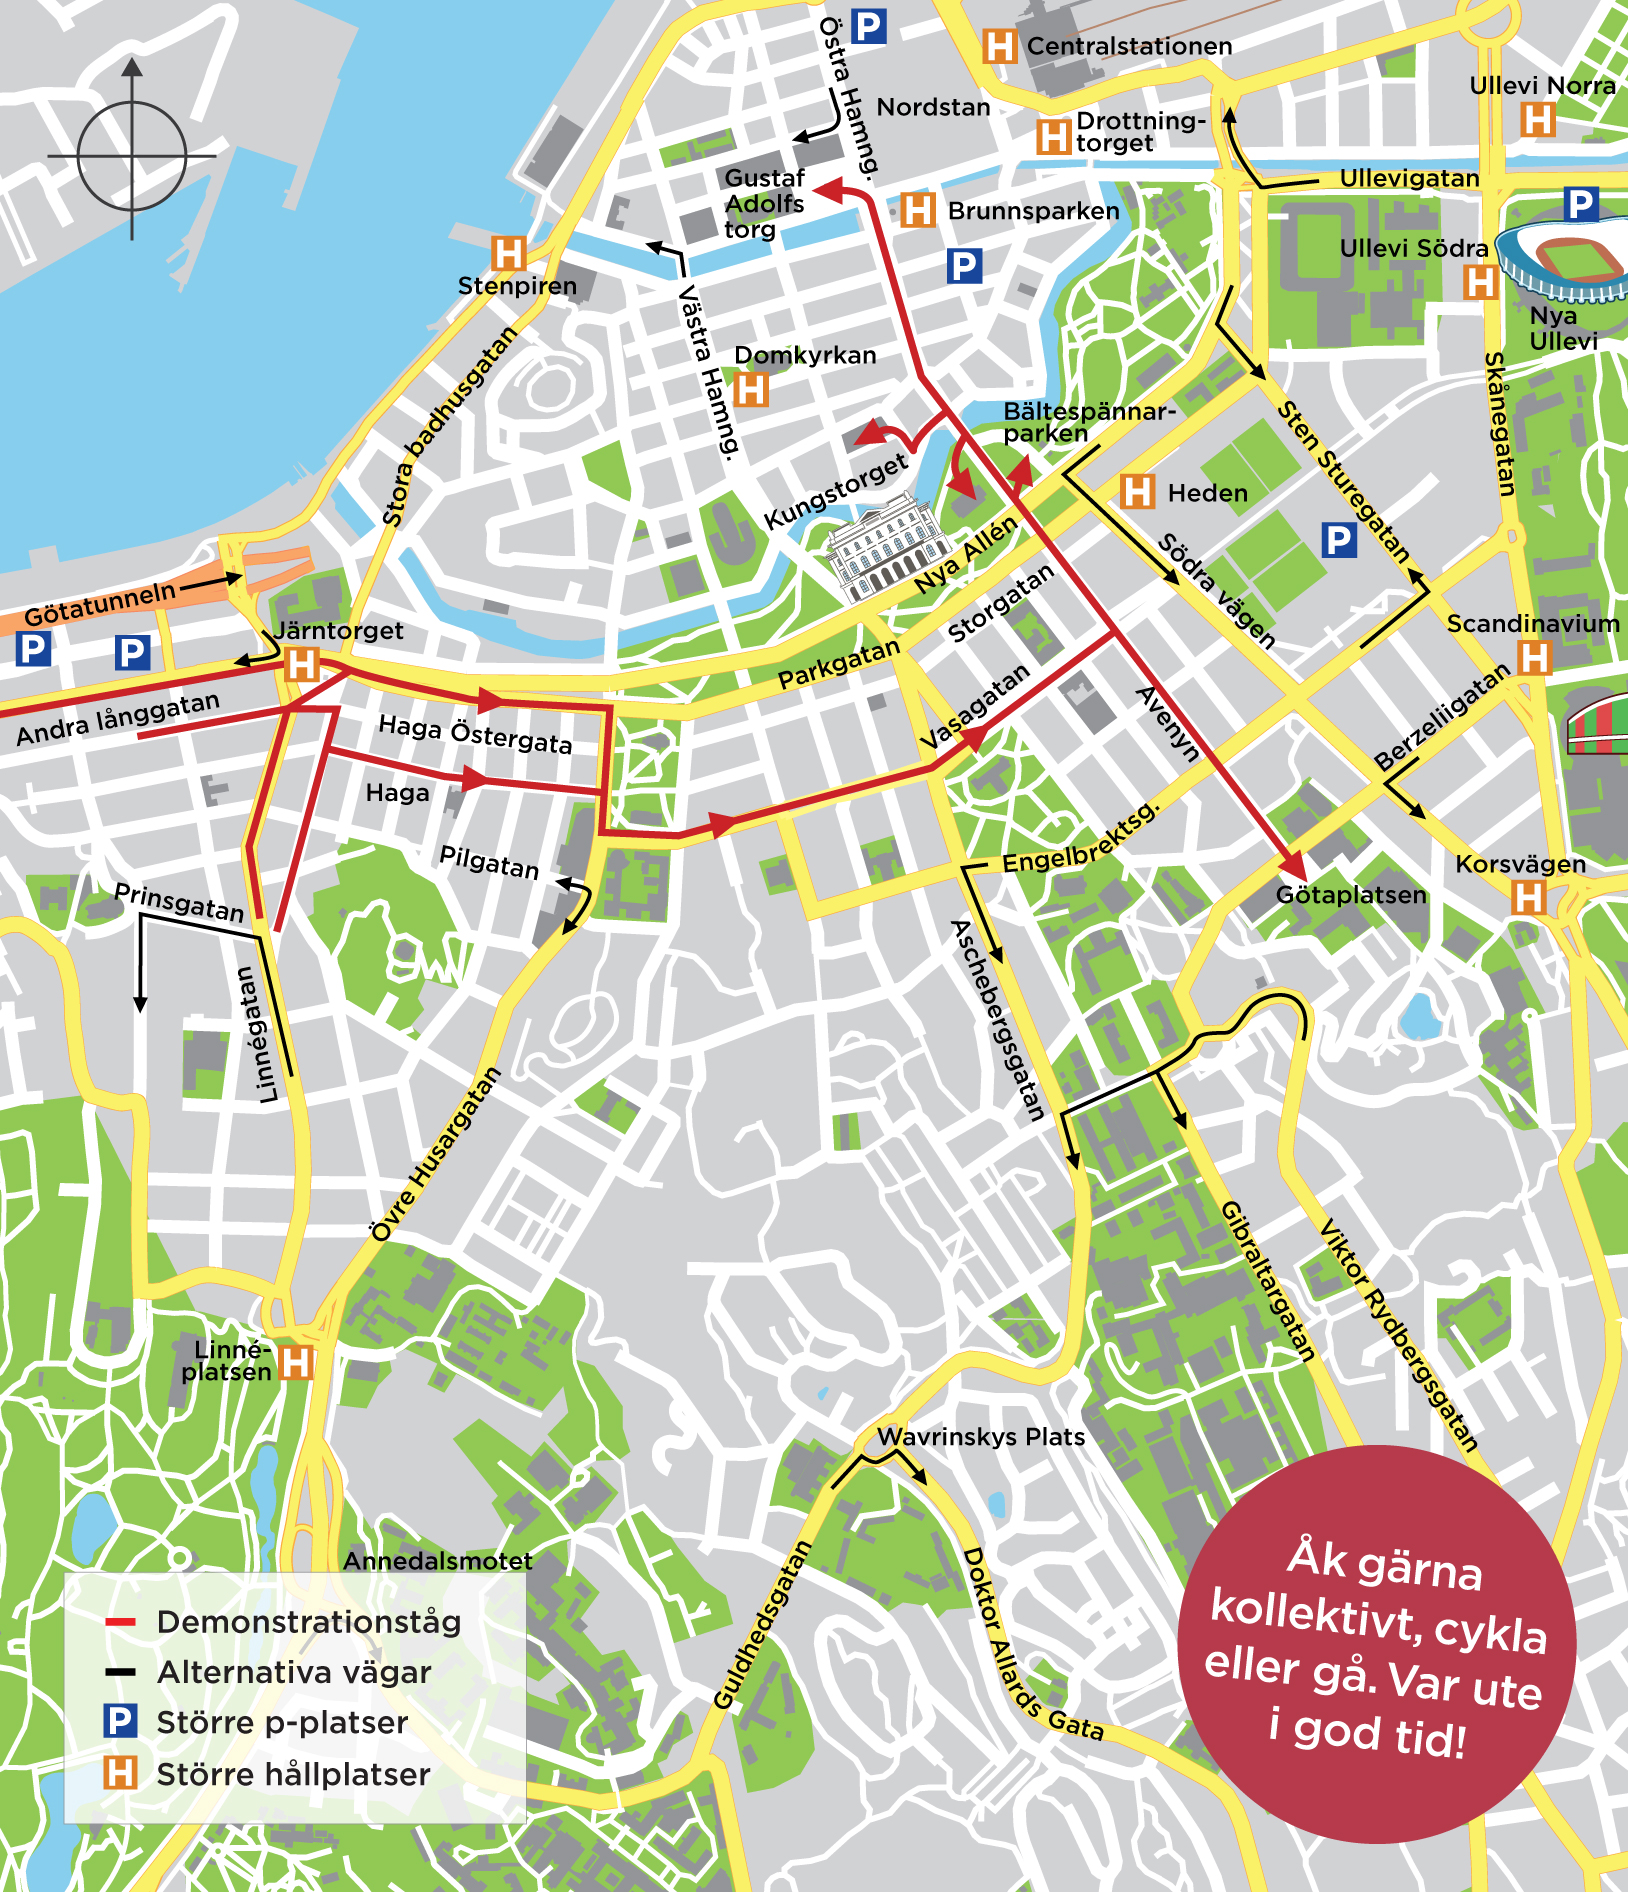 avenyn göteborg karta Chalmerscortègen och 1:a maj | Trafiken.nu Göteborg avenyn göteborg karta